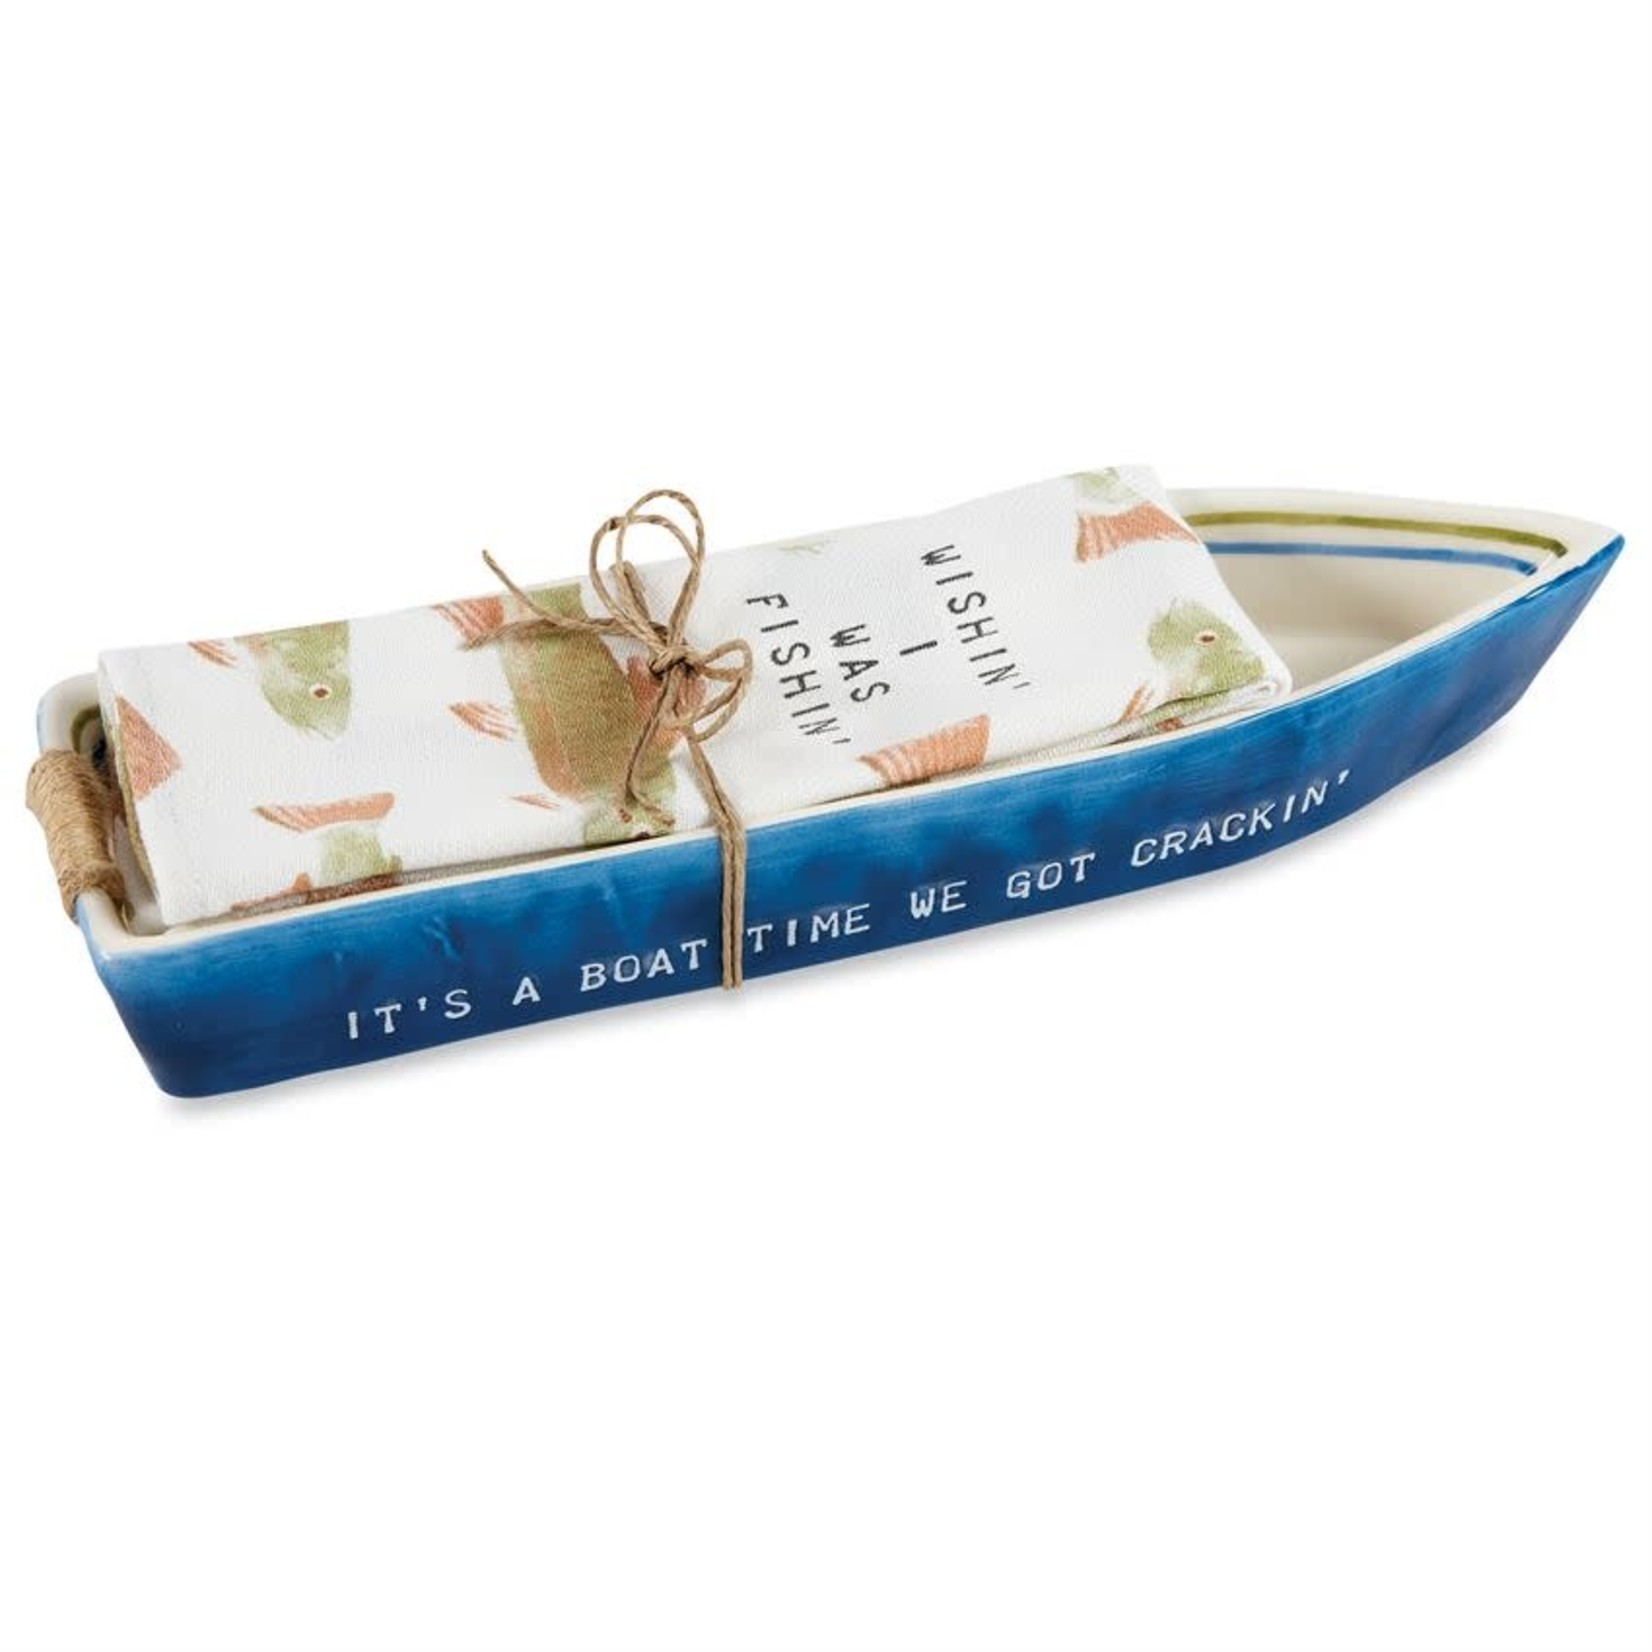 Navy Boat Dish & Towel Set